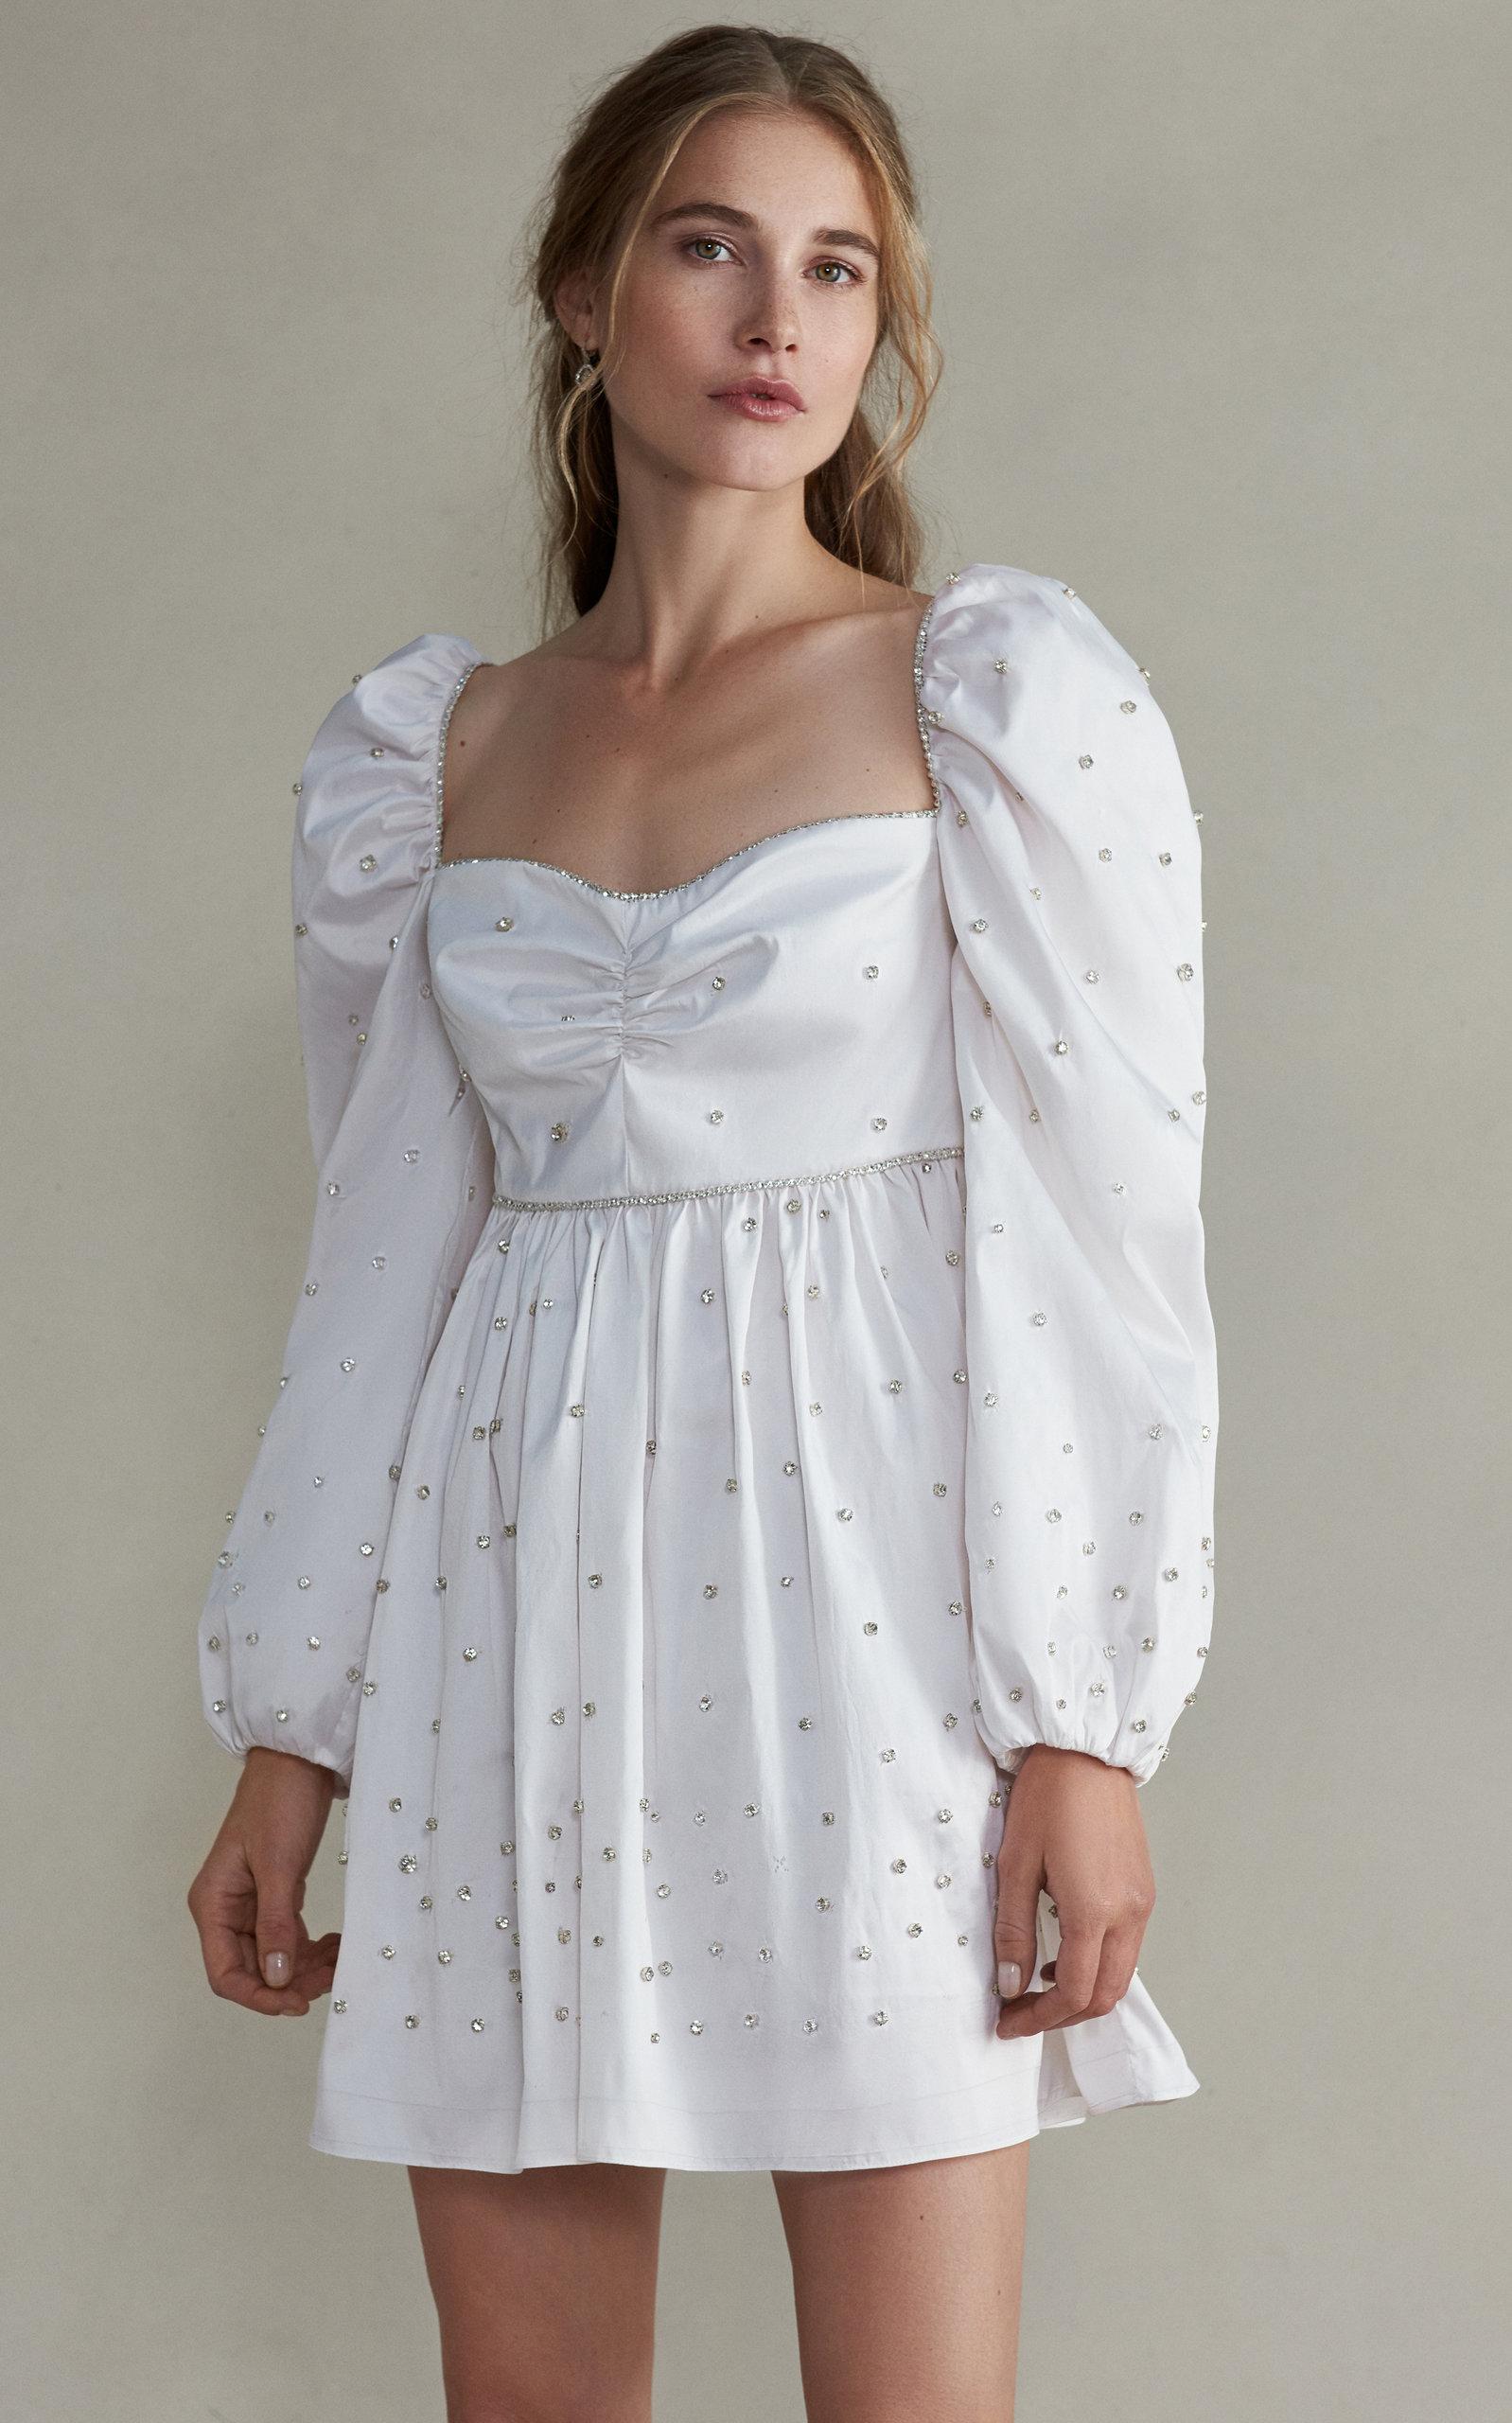 MARKARIAN Caspian Mini Silk Embellished Dress With Gathered Puff Sleeve in White